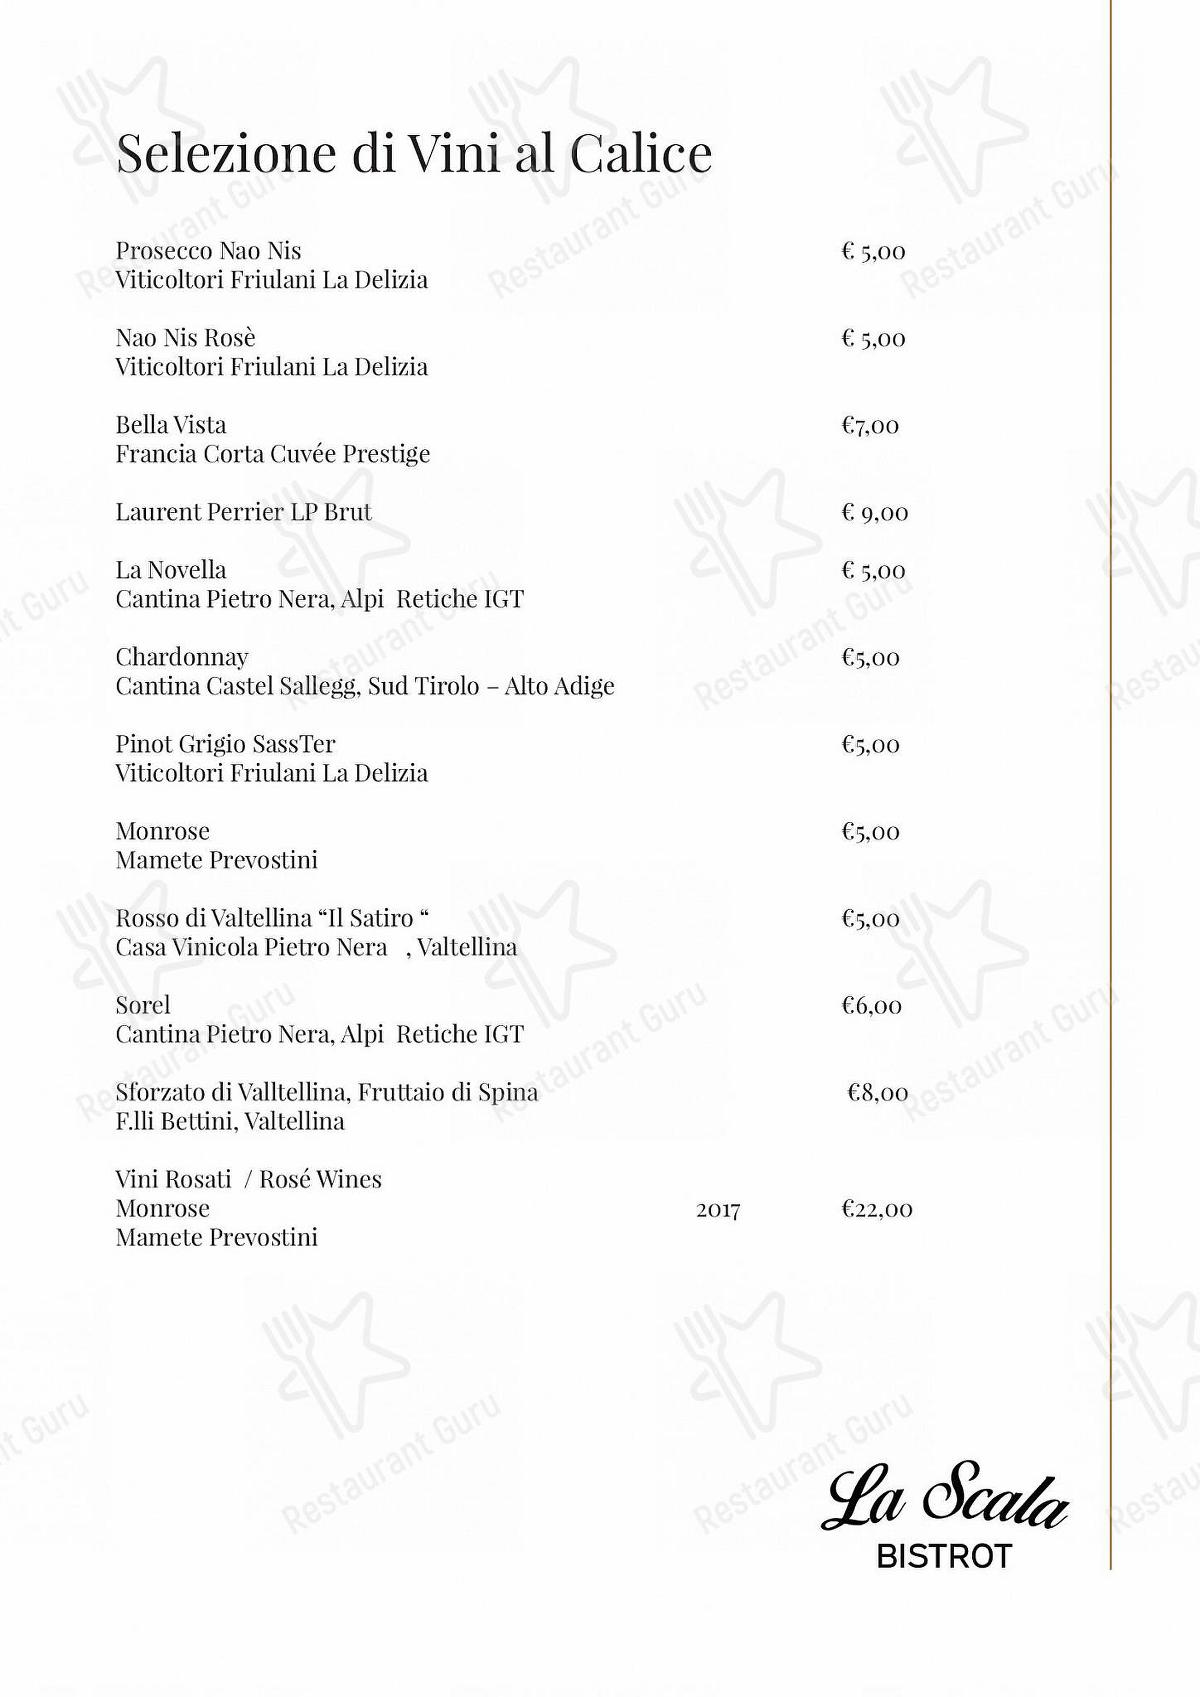 Menu per La Scala Bistrot ristorante